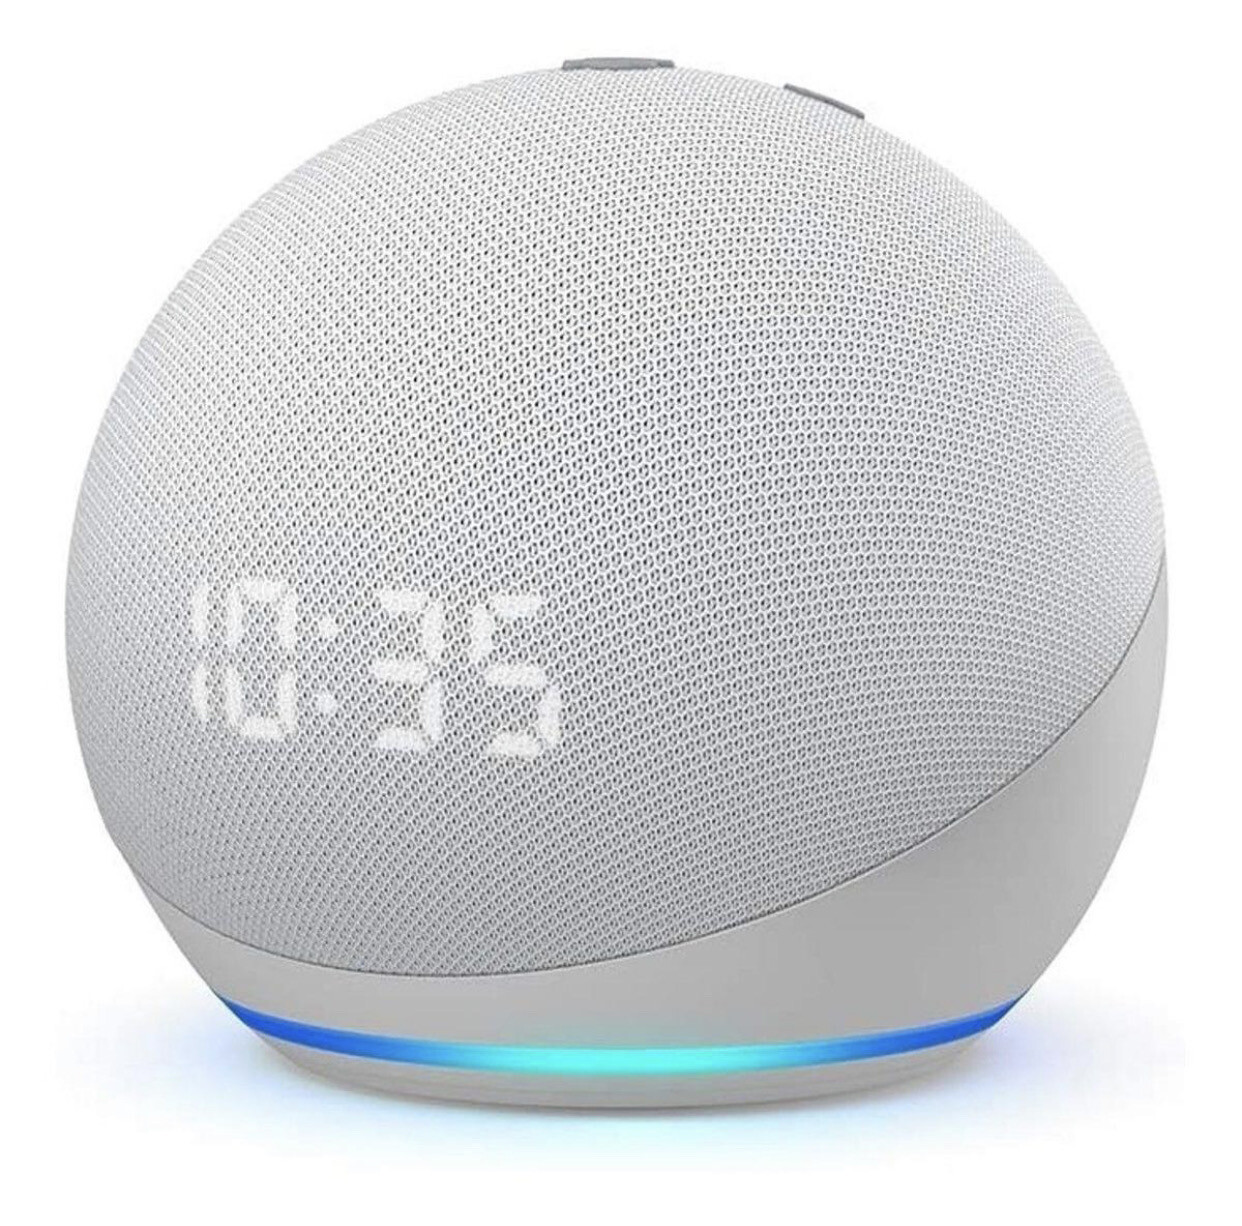 Amazon Echo Dot 4th Gen with clock con asistente virtual Alexa, pantalla integrada glacier white 110V/240V